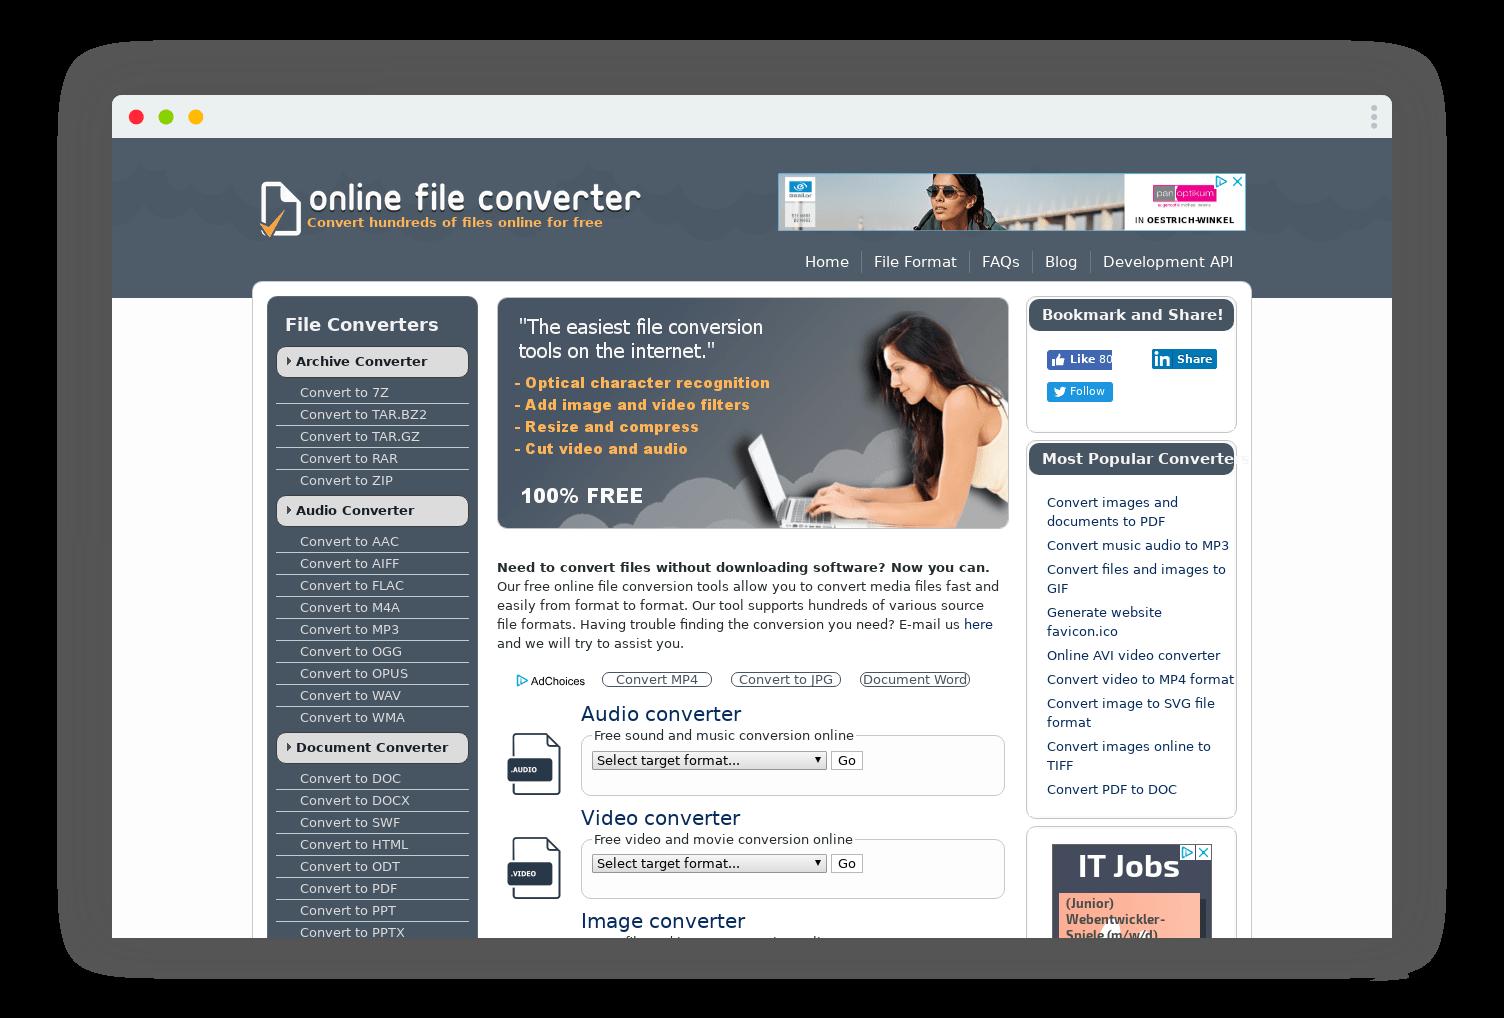 online file converter conversion format